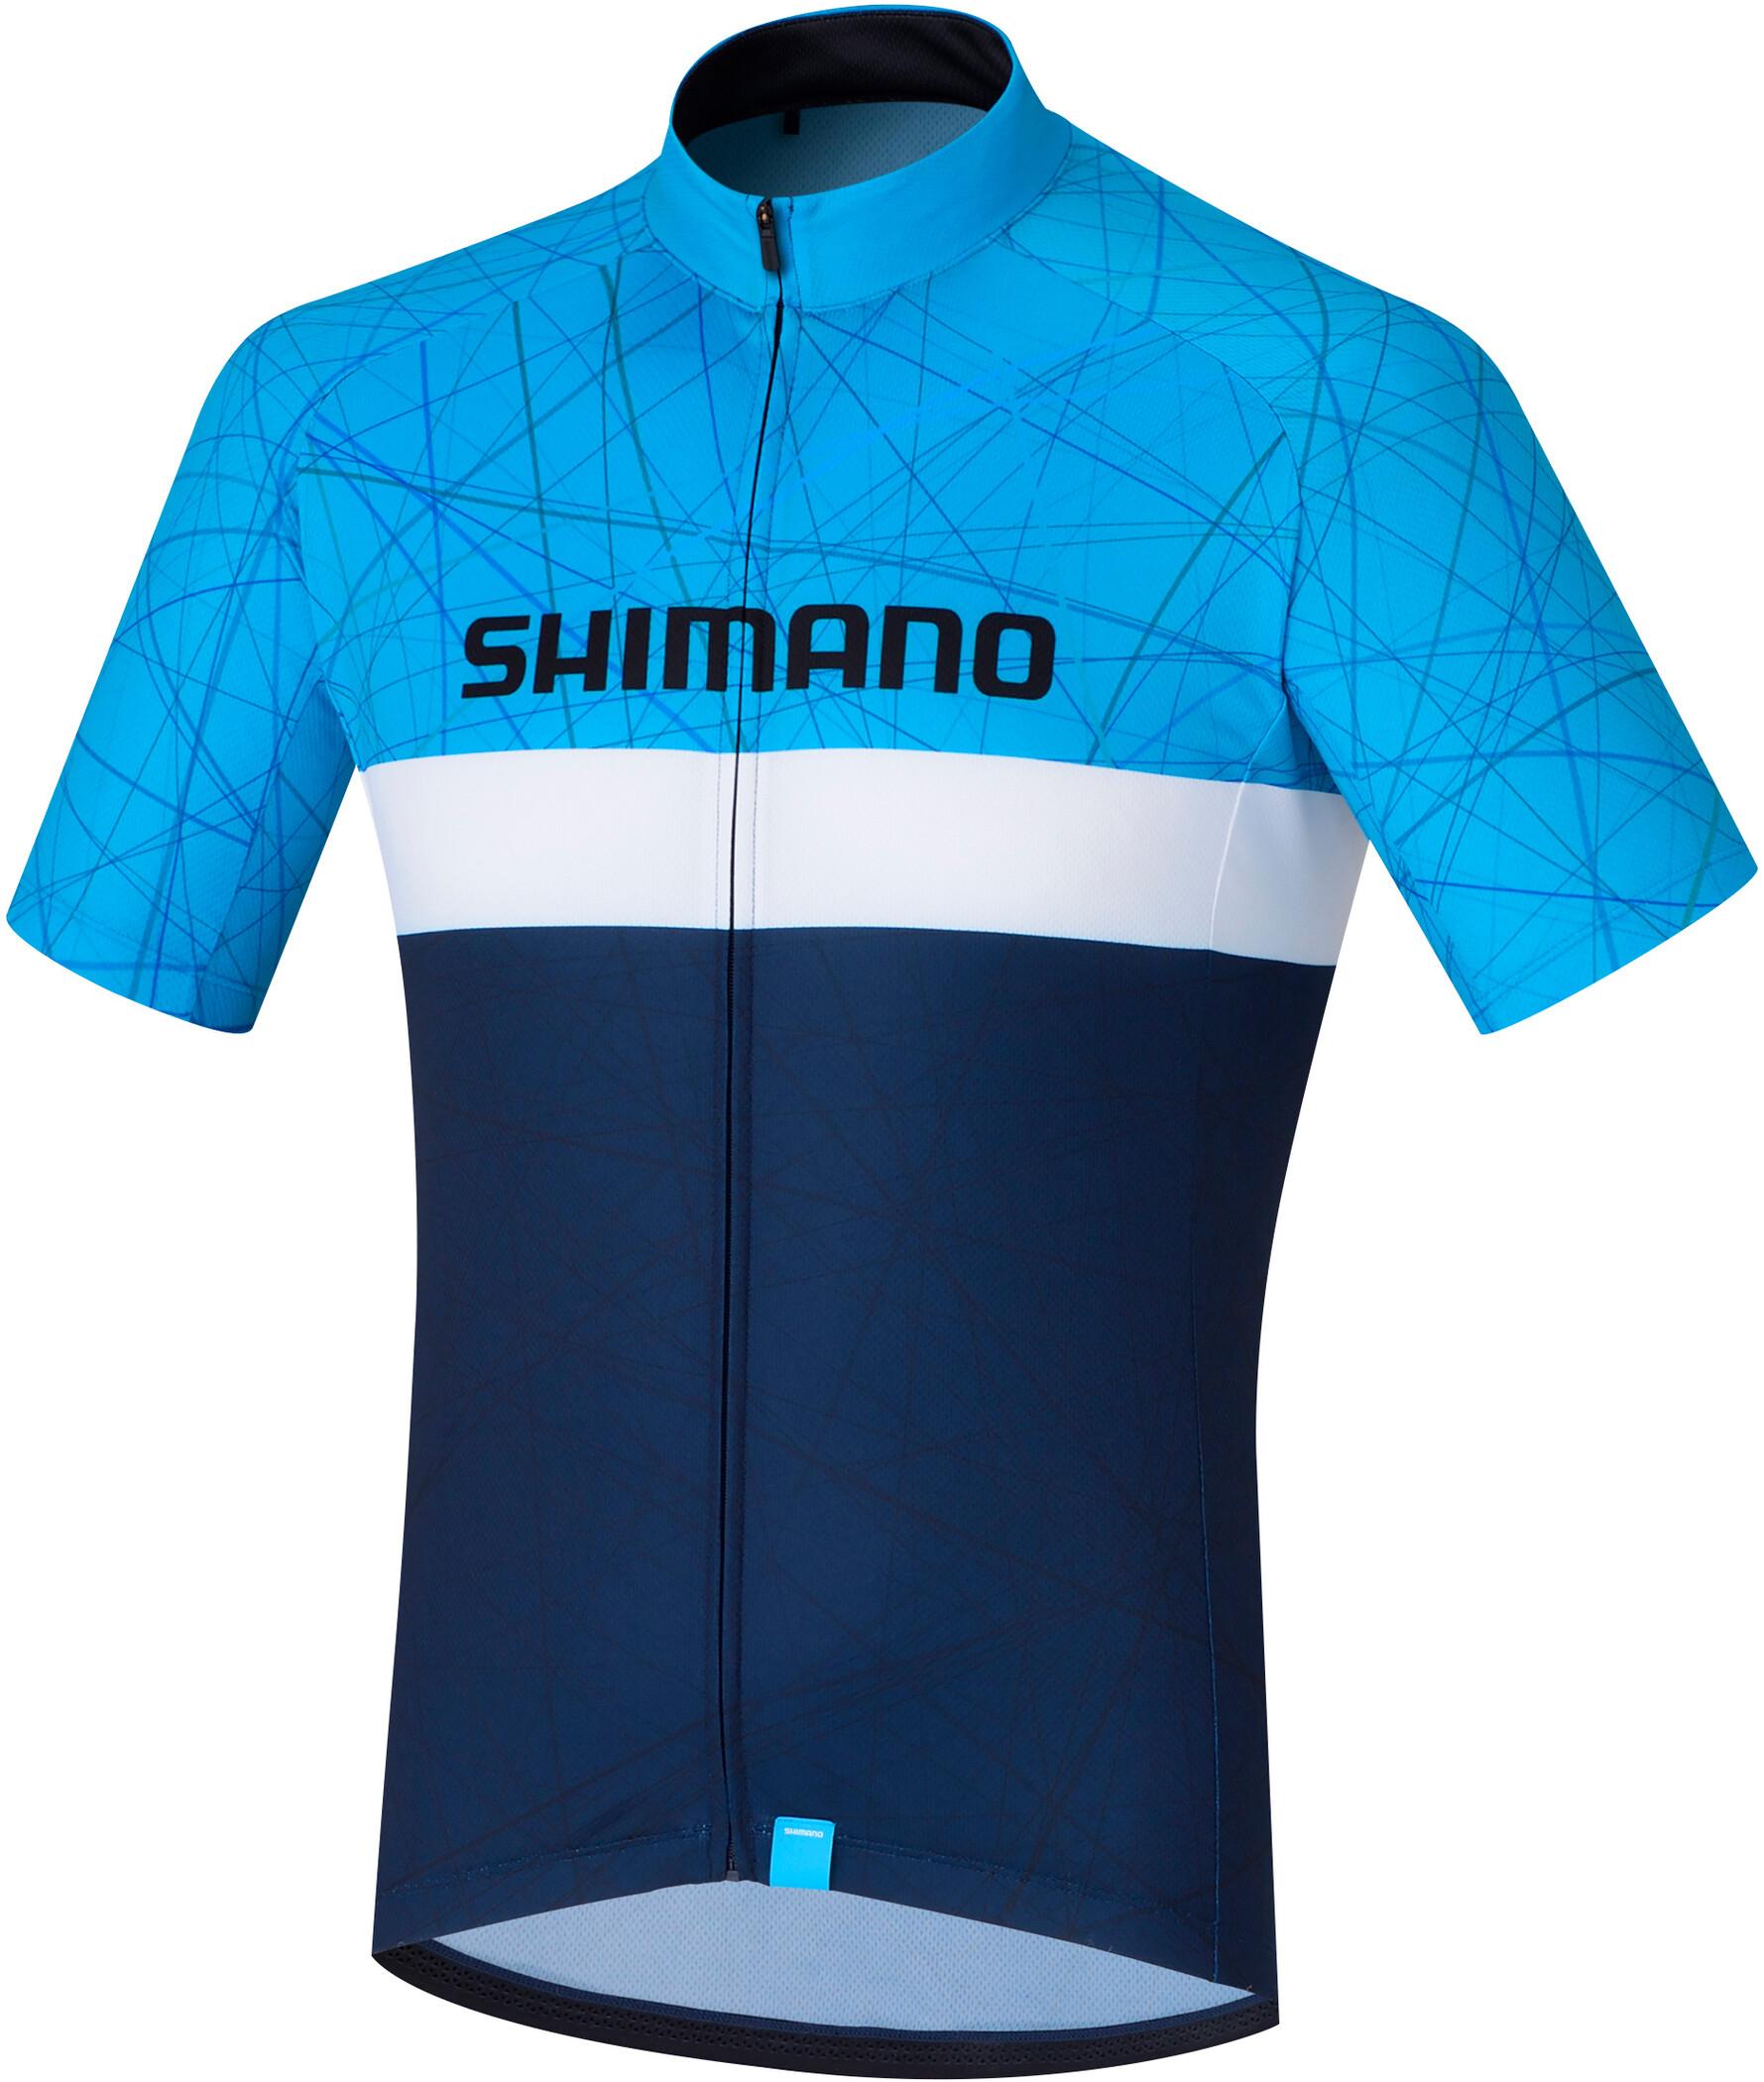 Shimano Team Kortærmet cykeltrøje Herrer, navy (2019) | Jerseys